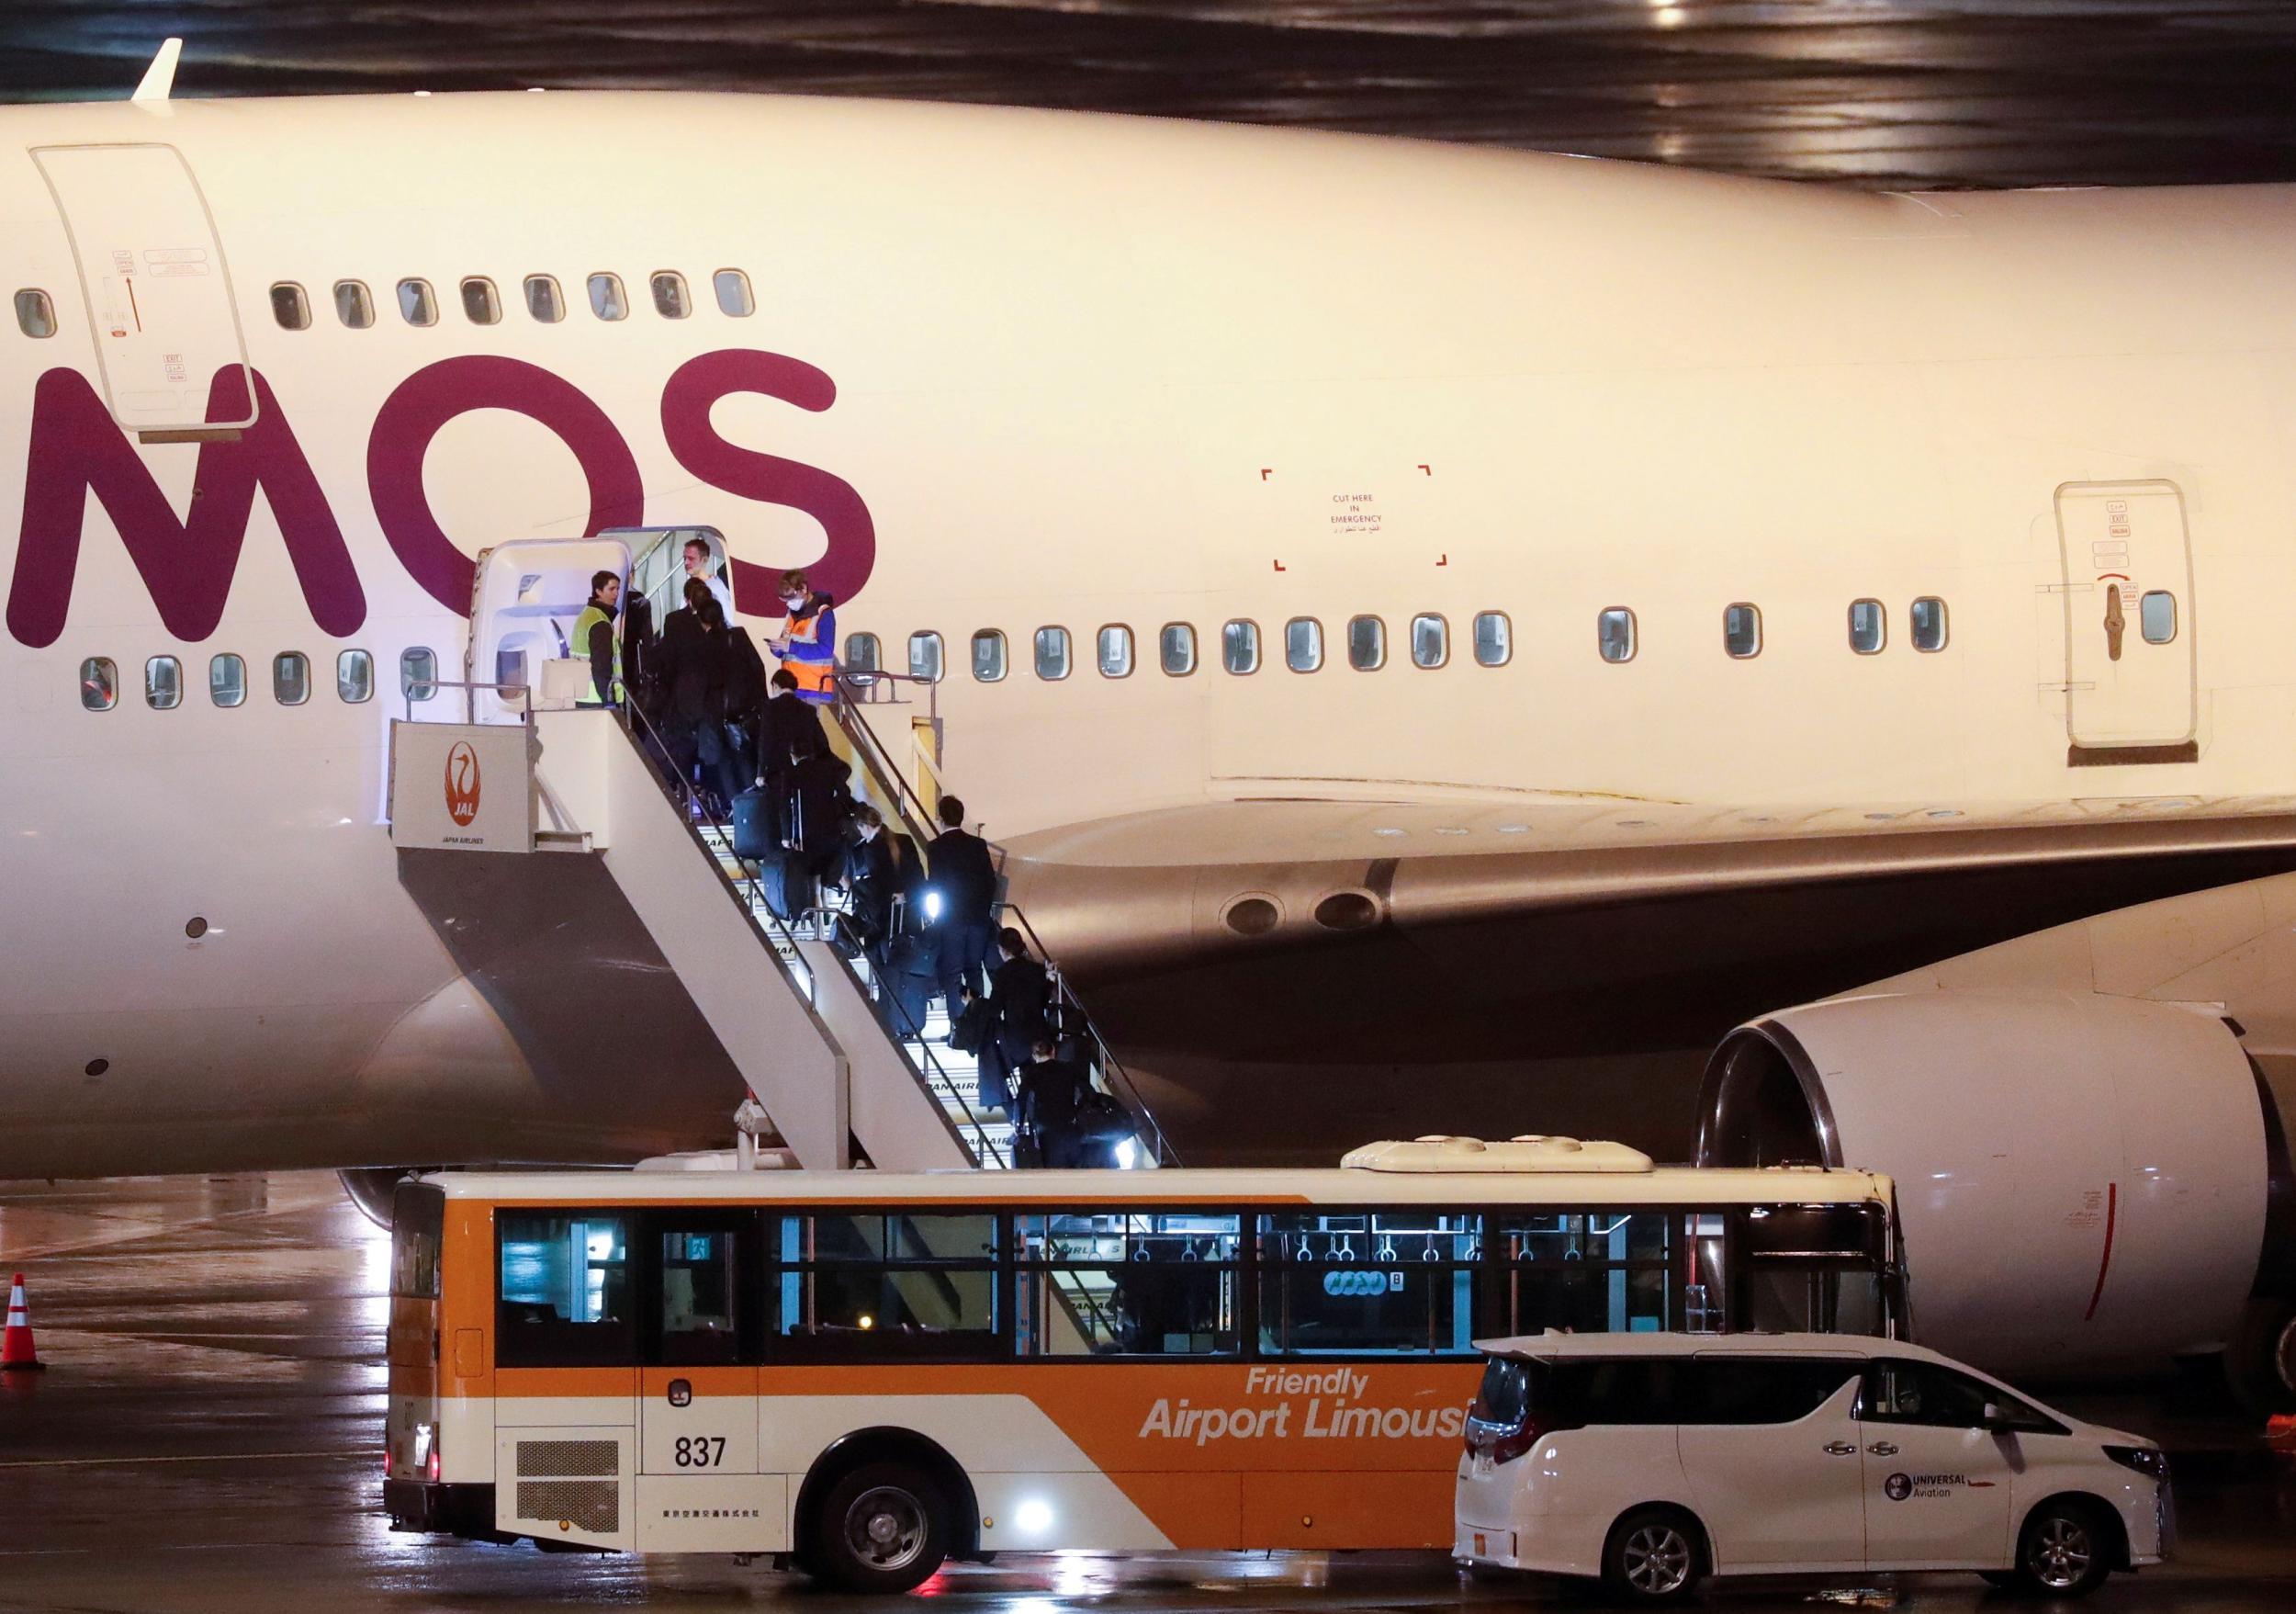 Coronavirus: Evacuation flight carrying Britons from quarantined cruise ship takes off from Japan